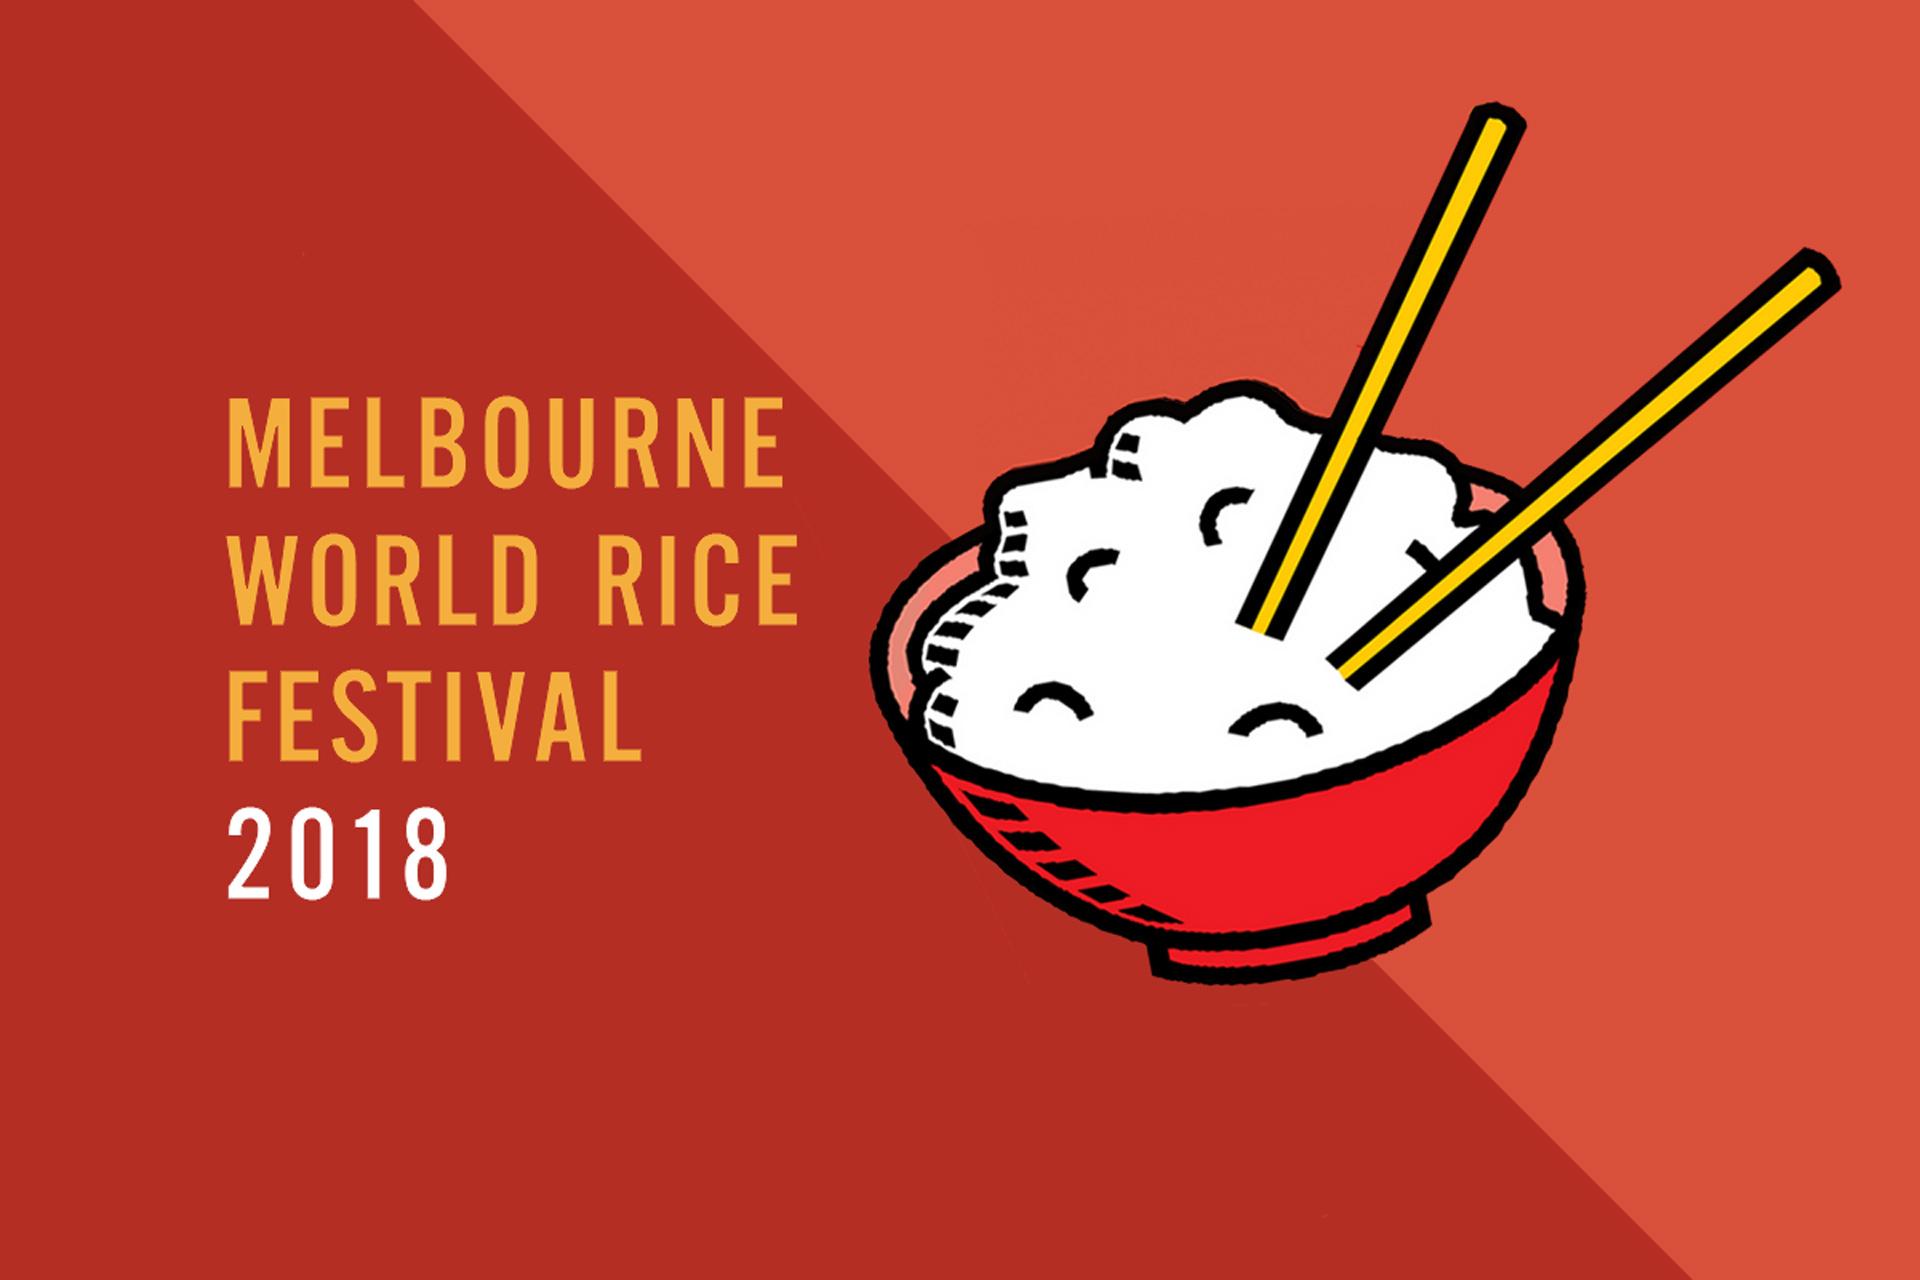 Melbourne World Rice Festival